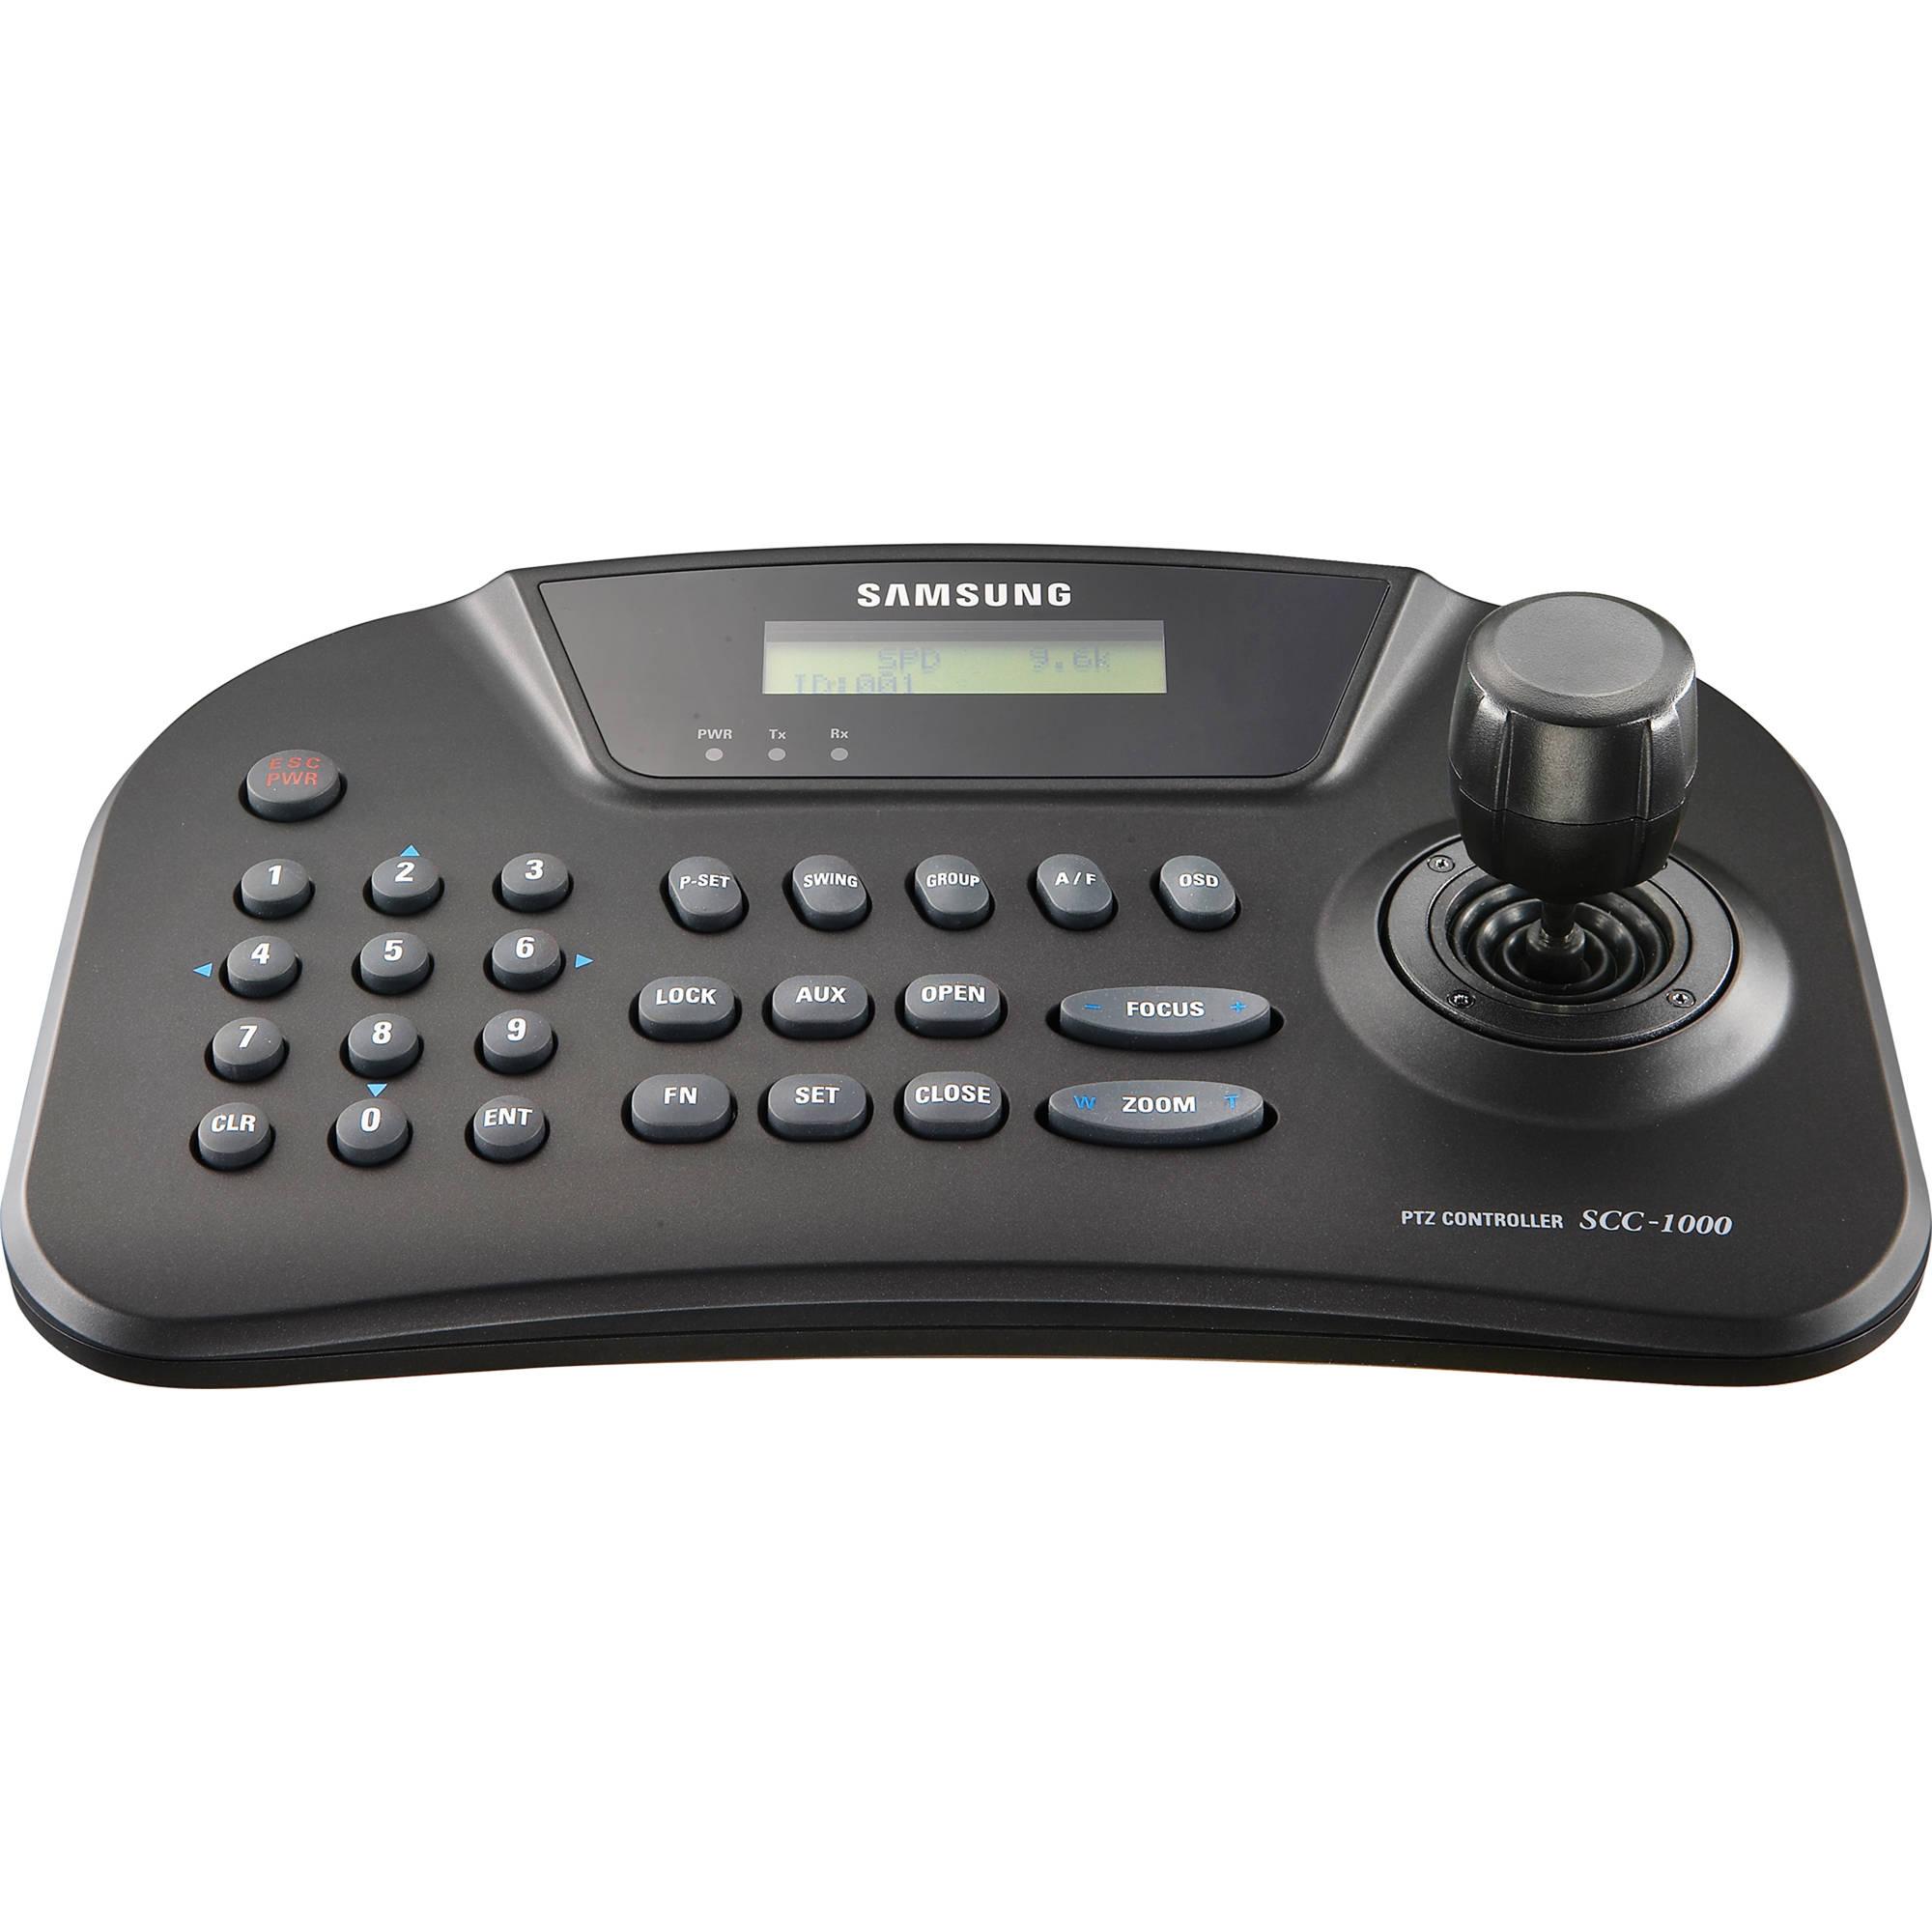 Samsung Techwin Spc 1010 Ptz Control Keyboard Bh Photo Pelco Rs485 Wiring Diagram